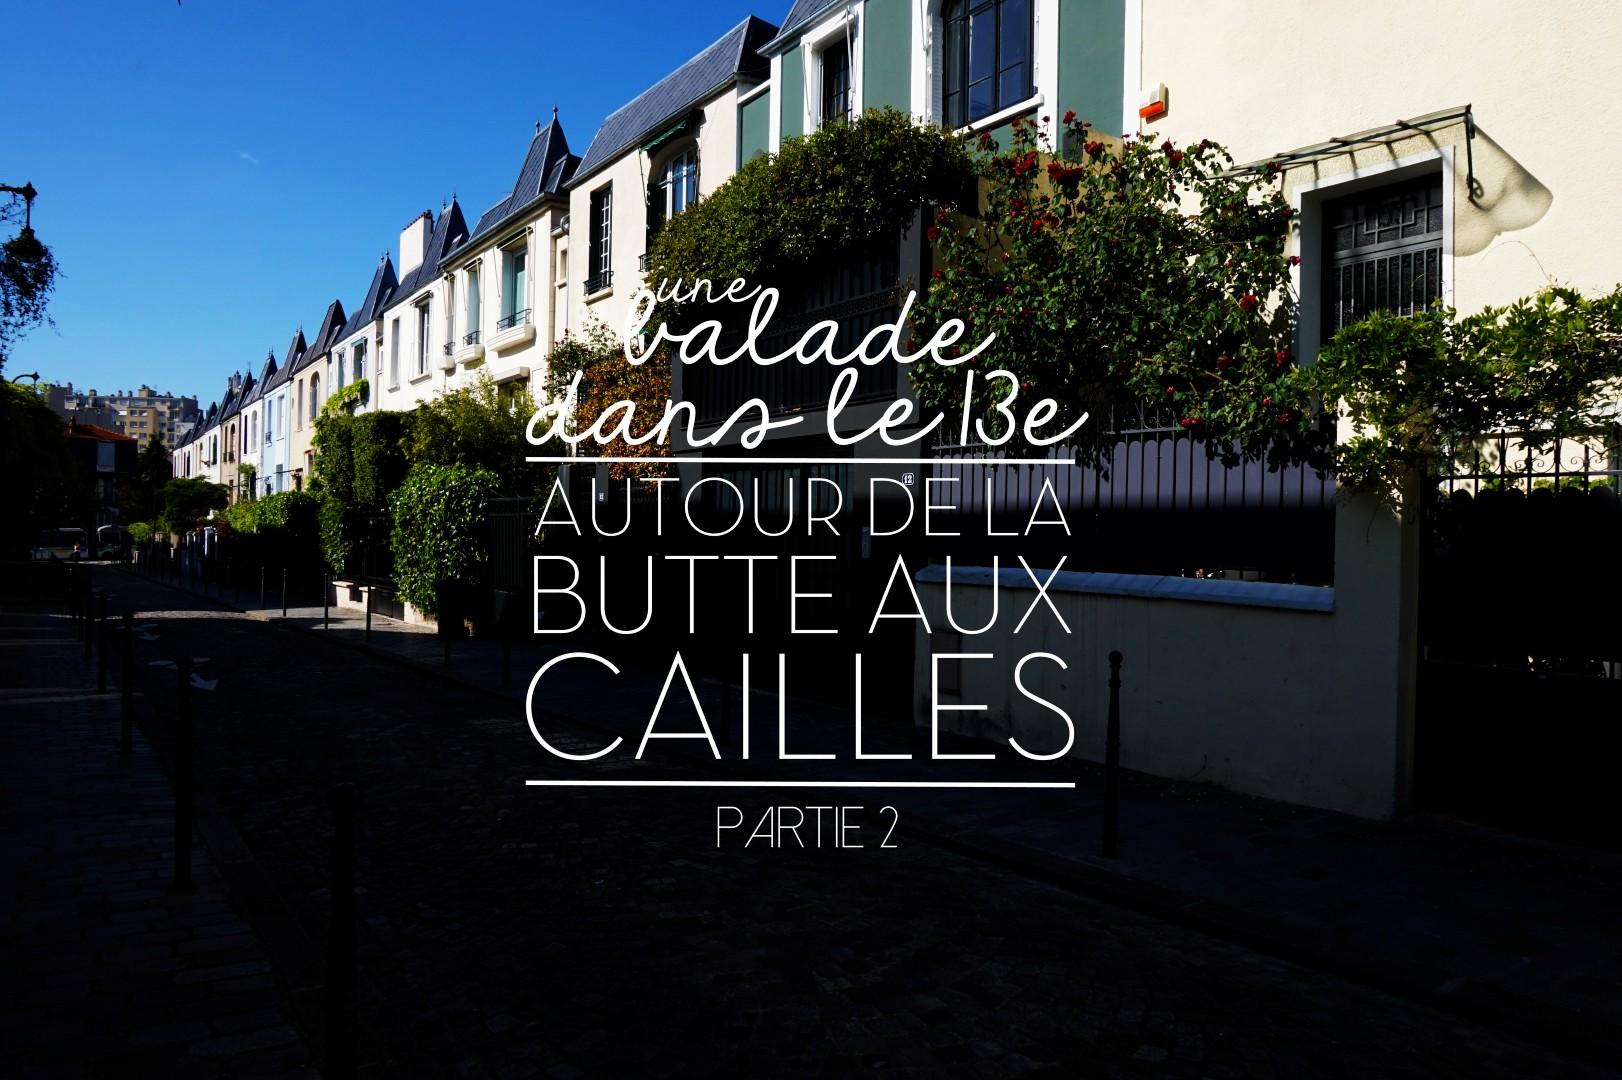 2015_balade_13e_butte_cailles_2 (Large)